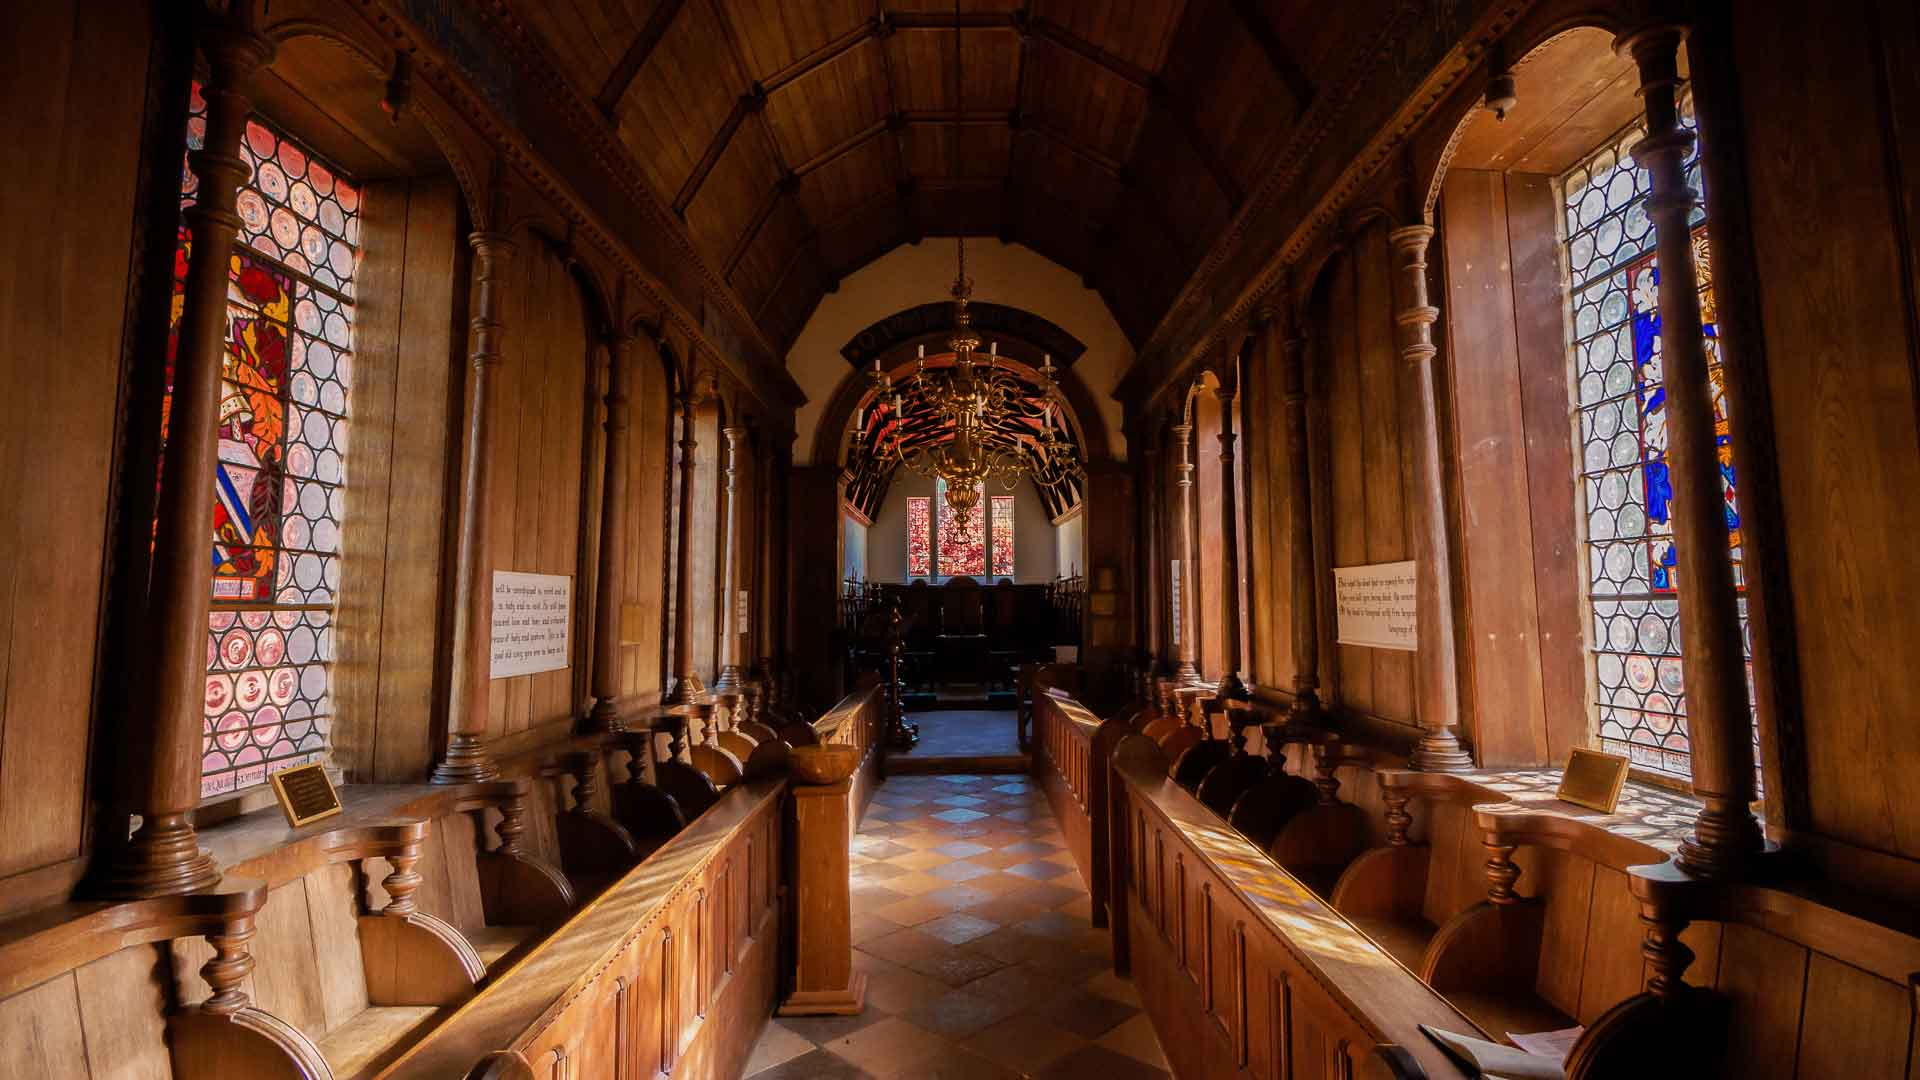 St Johns Church Little Gidding interior